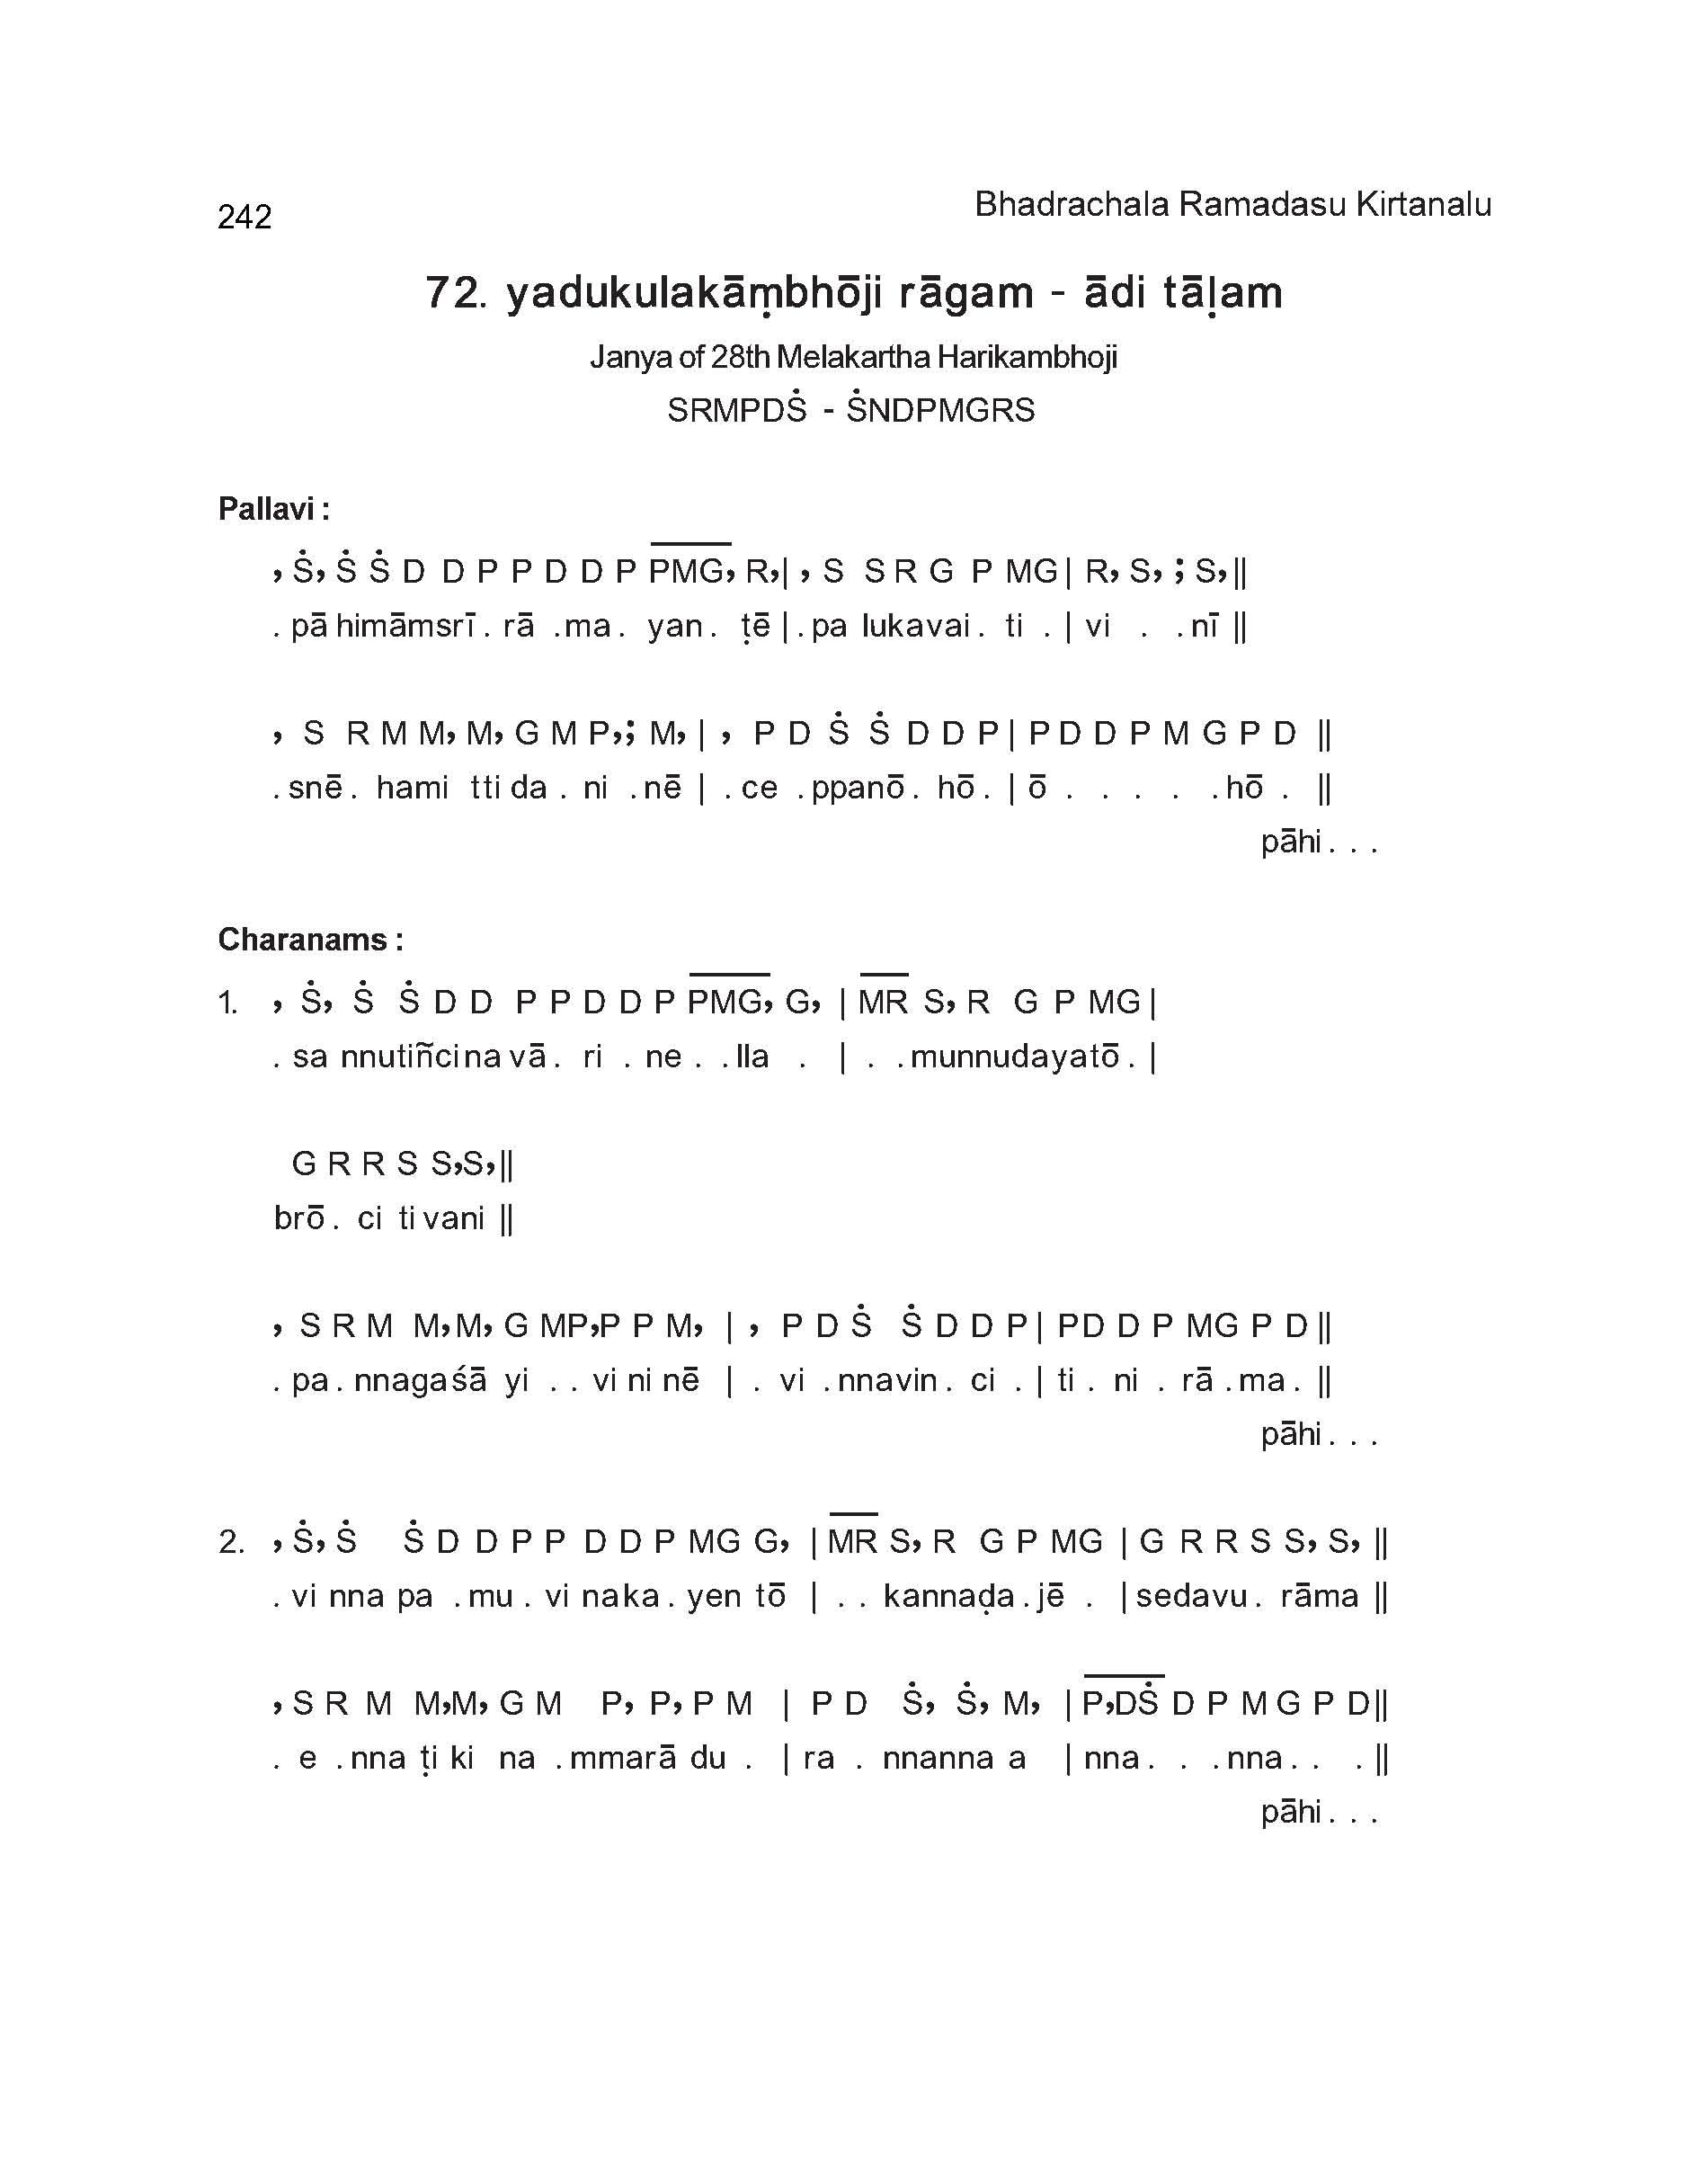 yadukulakambhoji ragam adi talam, bhadrachala ramadasu keertanalu